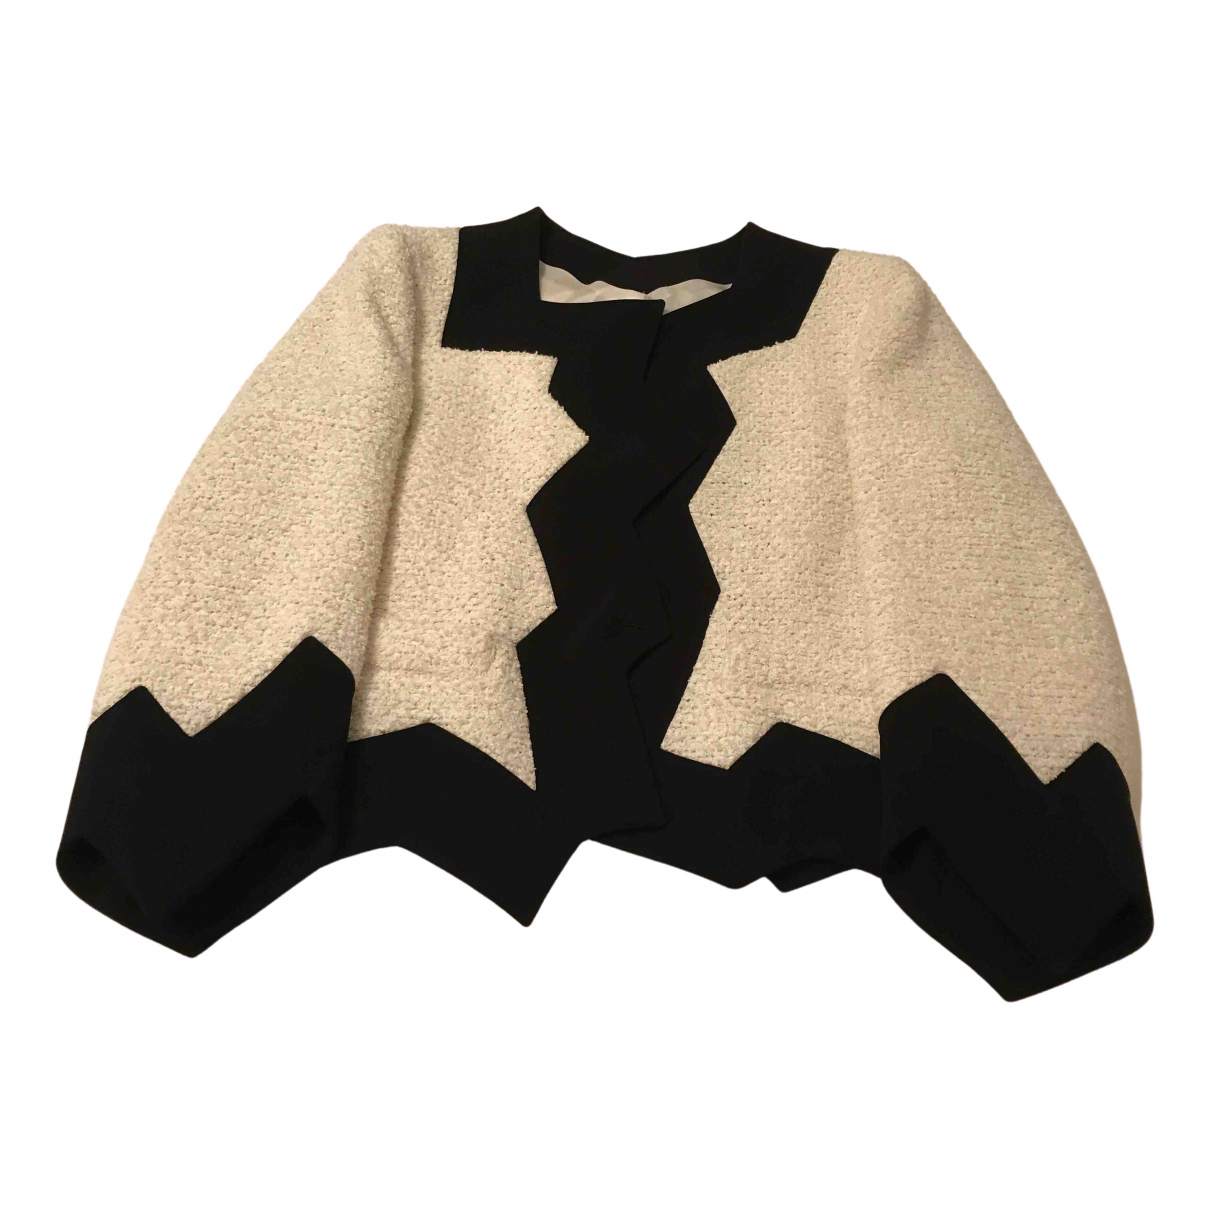 Moschino Cheap And Chic \N Ecru Cotton jacket for Women 8 UK